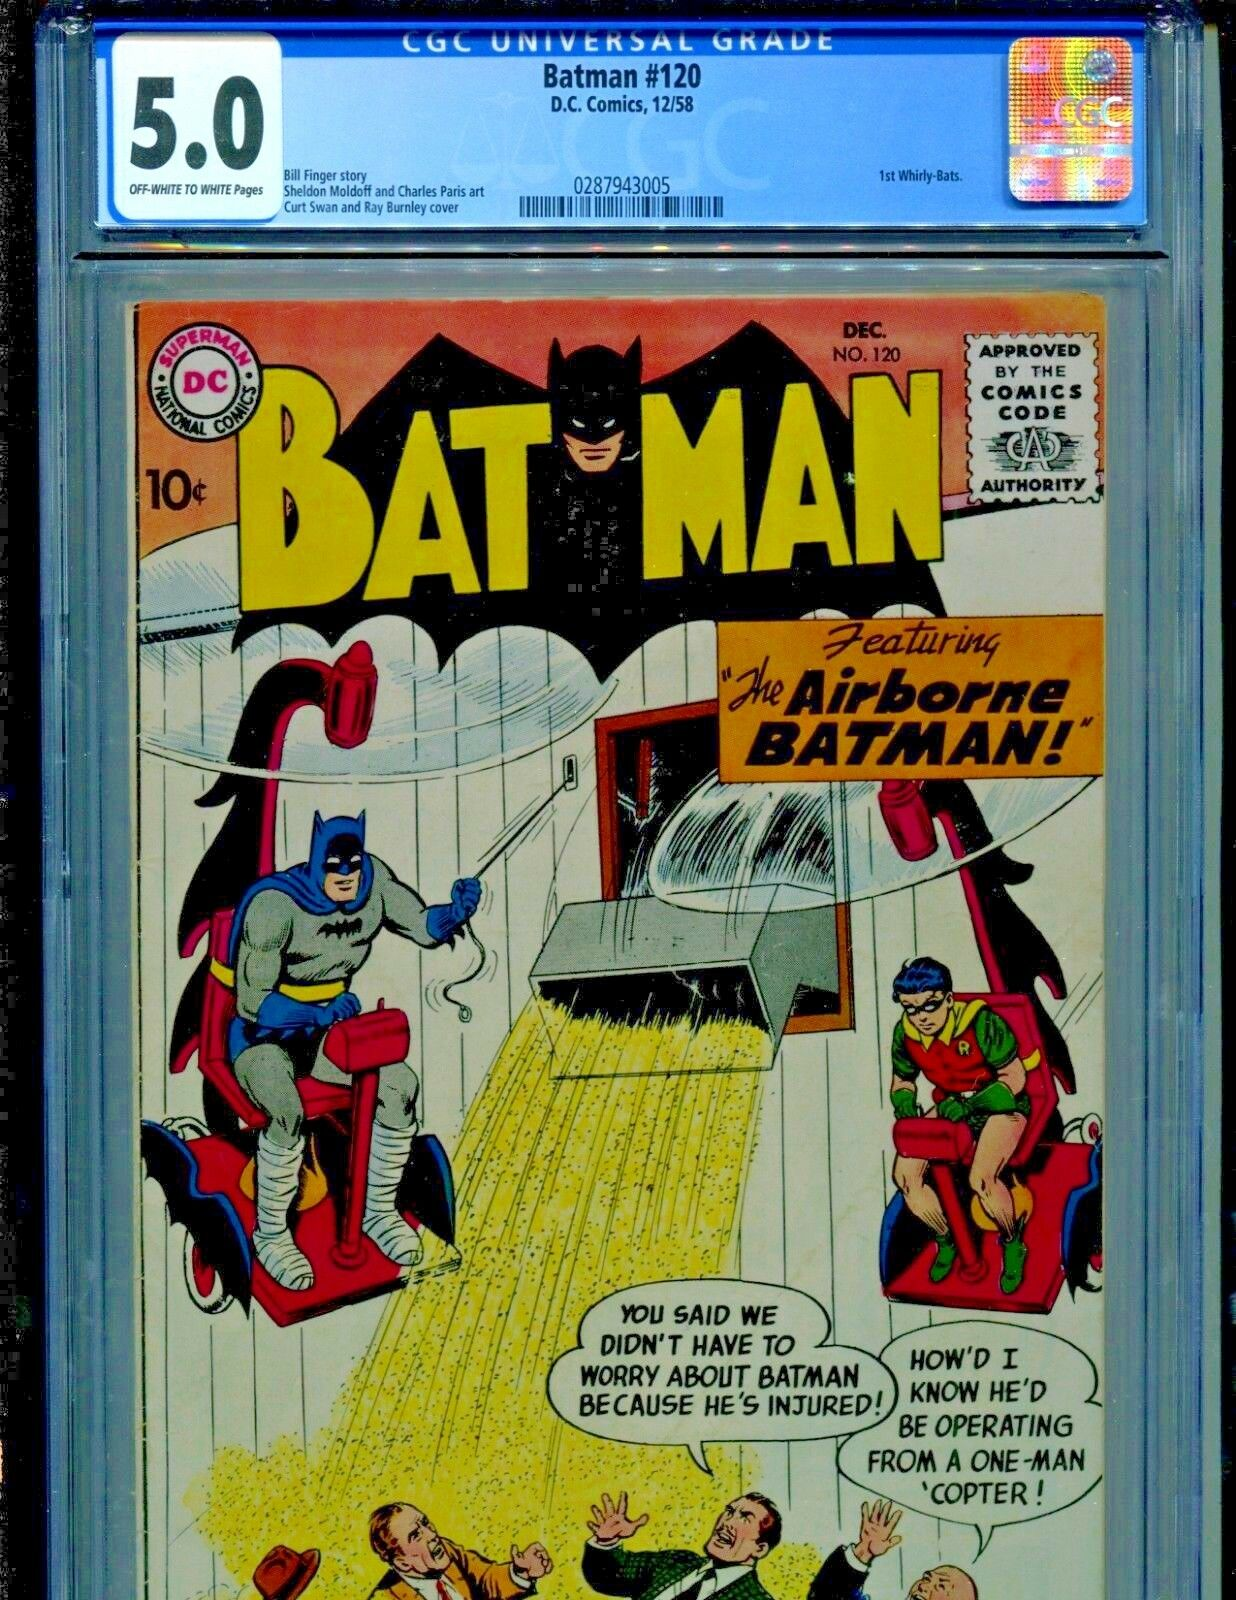 Batman #120 DC Comics 1958 1st Whirly-Bats CGC Graded 5.0